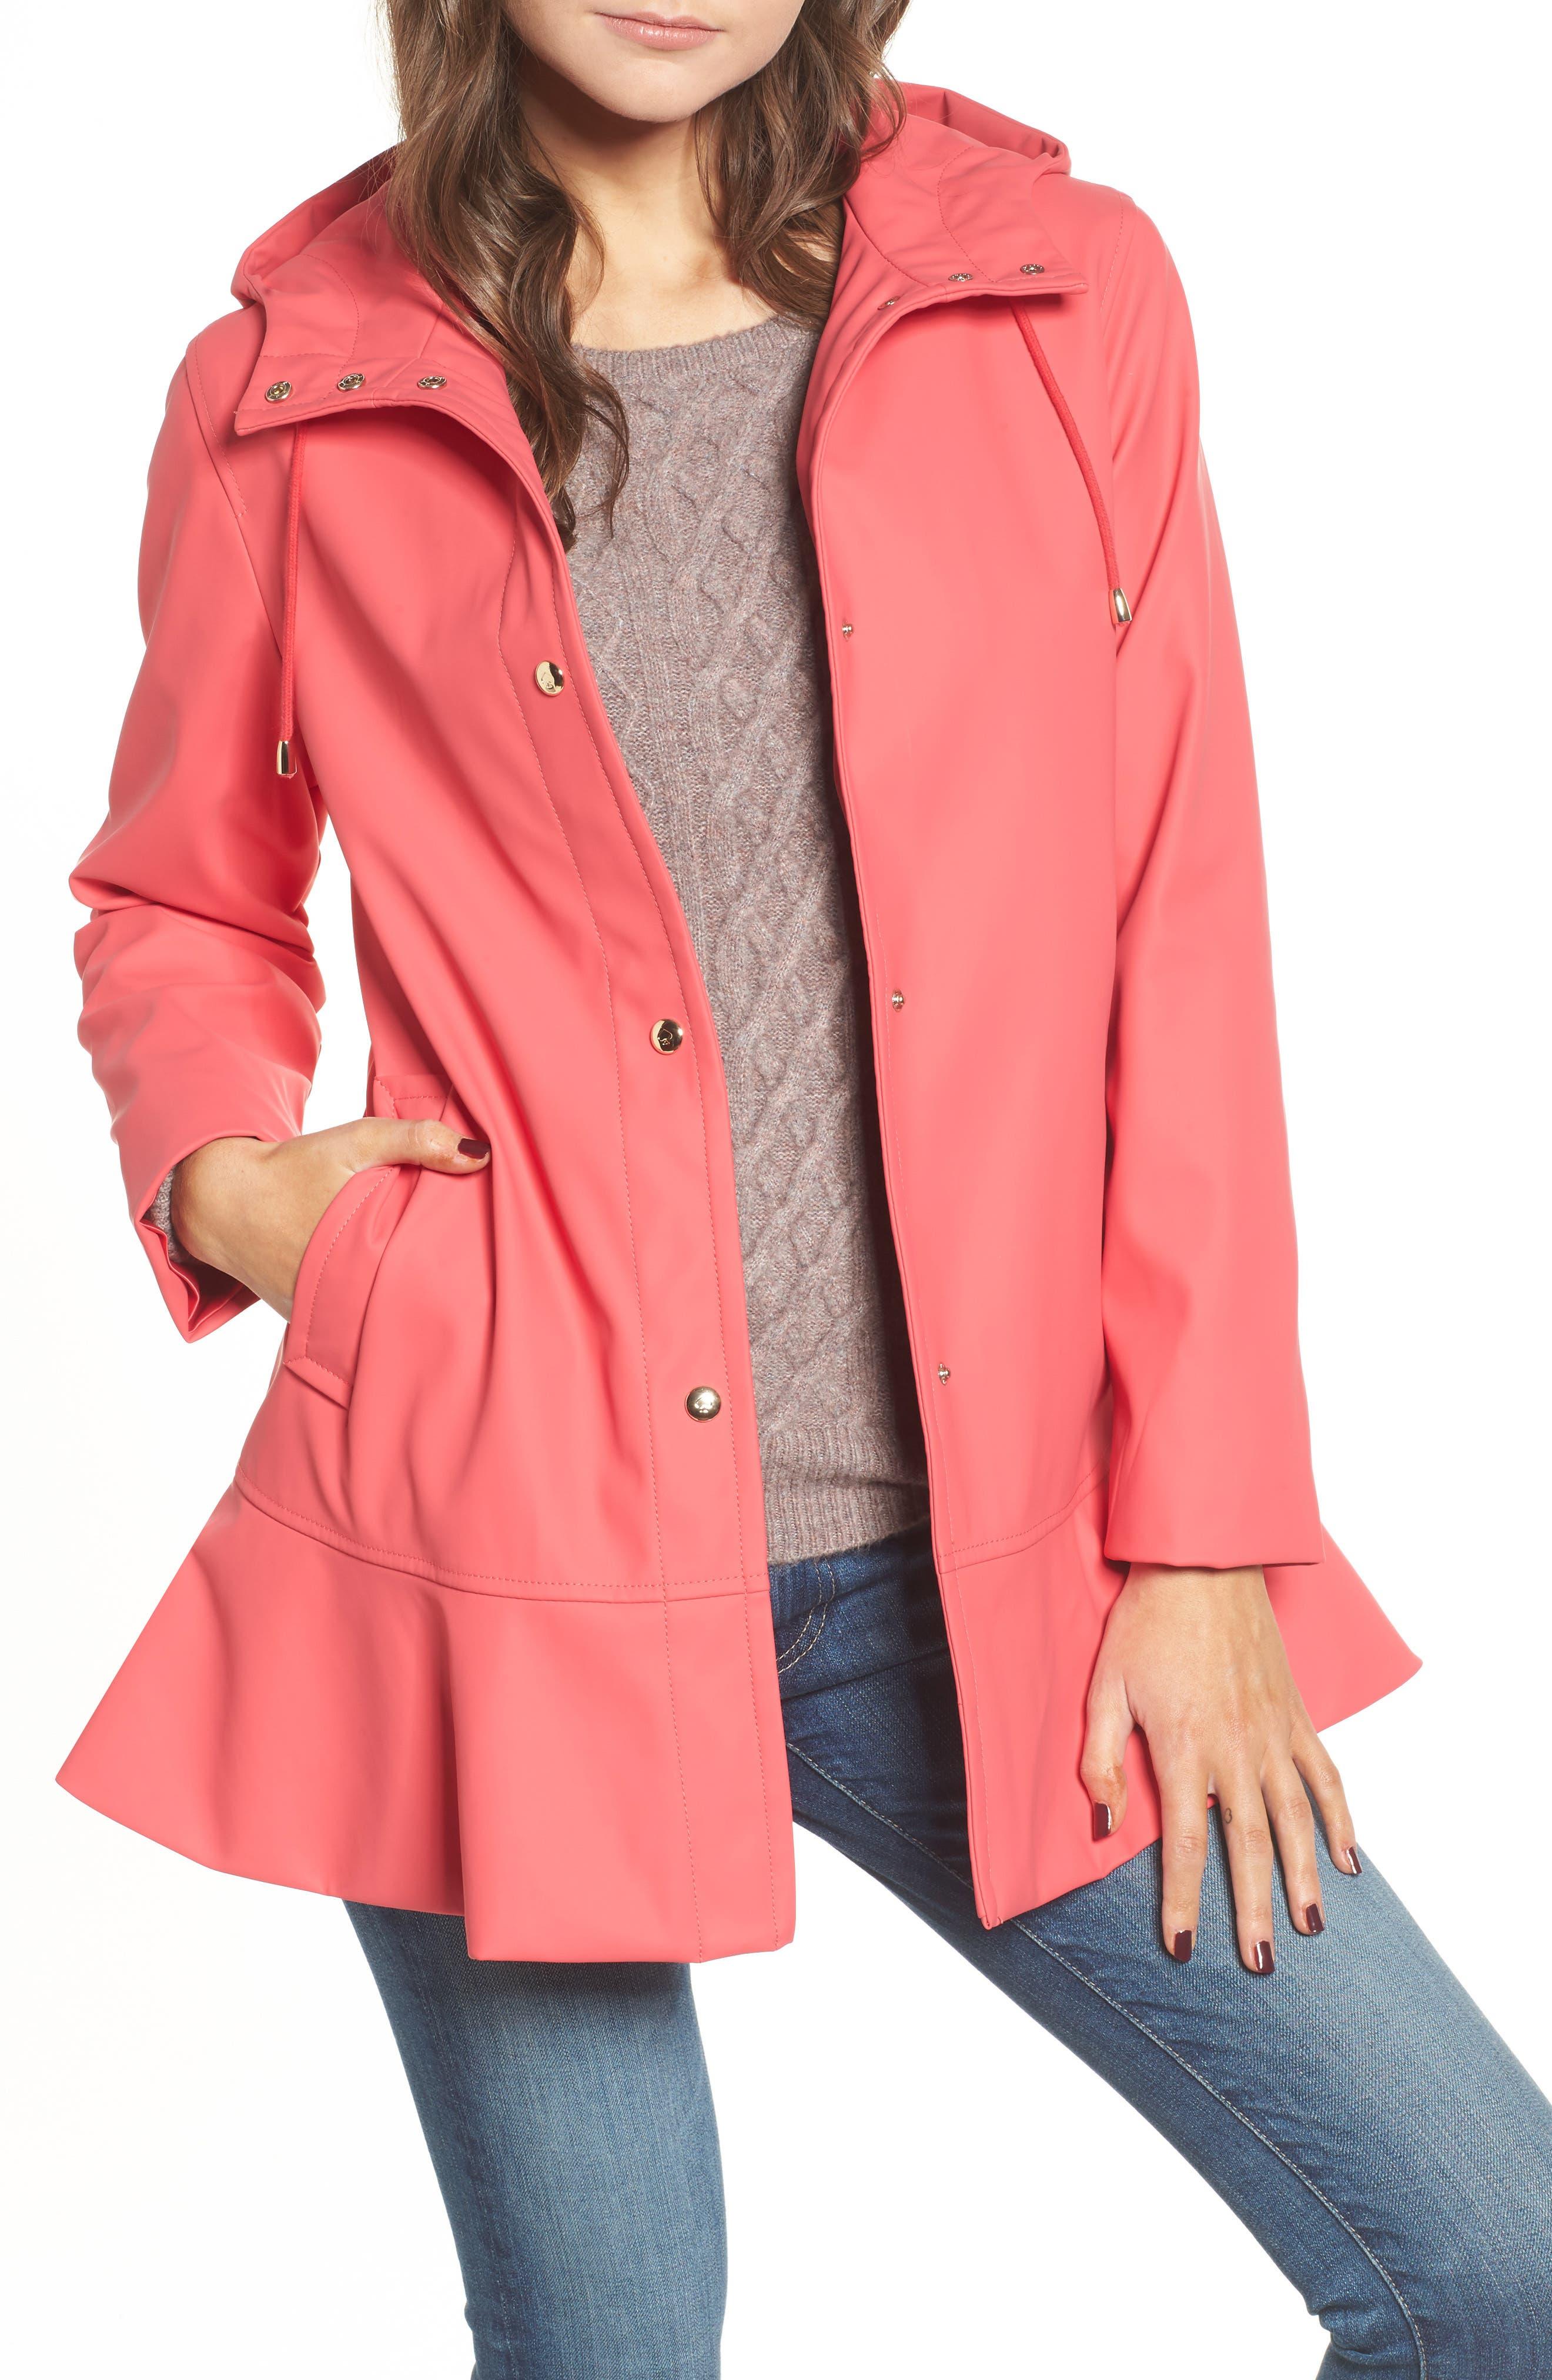 Main Image - kate spade new york hooded peplum rain coat